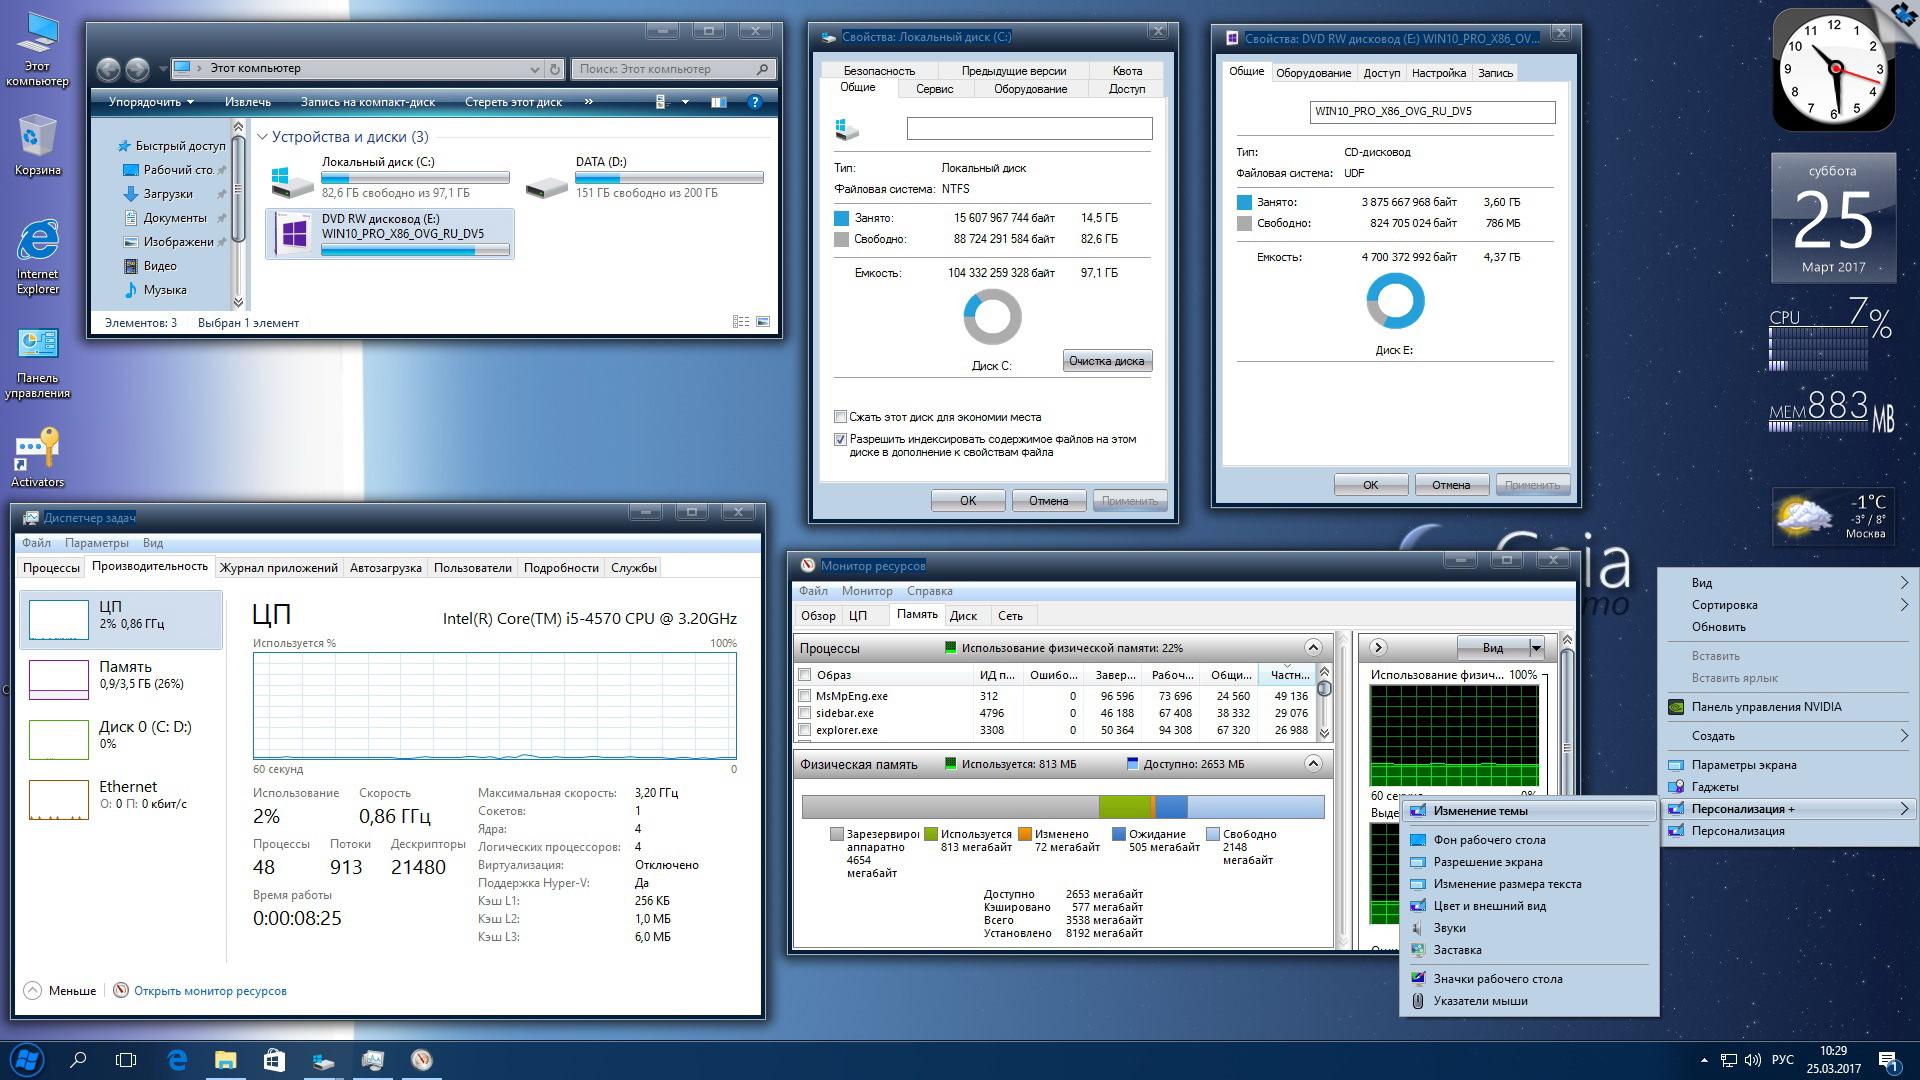 Microsoft project professional 2017 vl x86 x64 en - Download office 2013 full crack key ban quyen ...